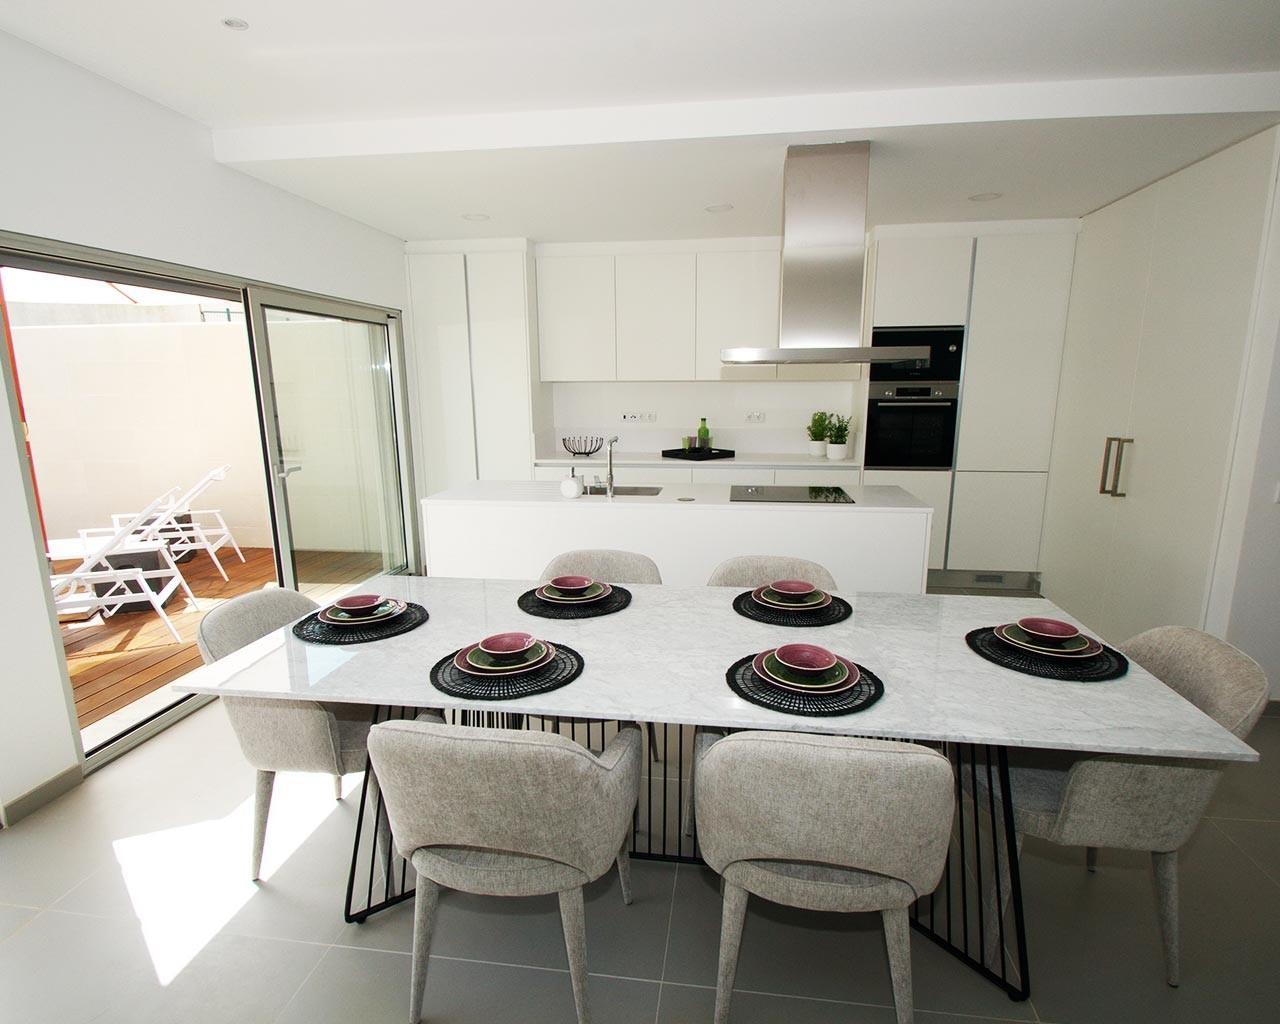 ferragudo-design-villas-sala de jantar+cozinha